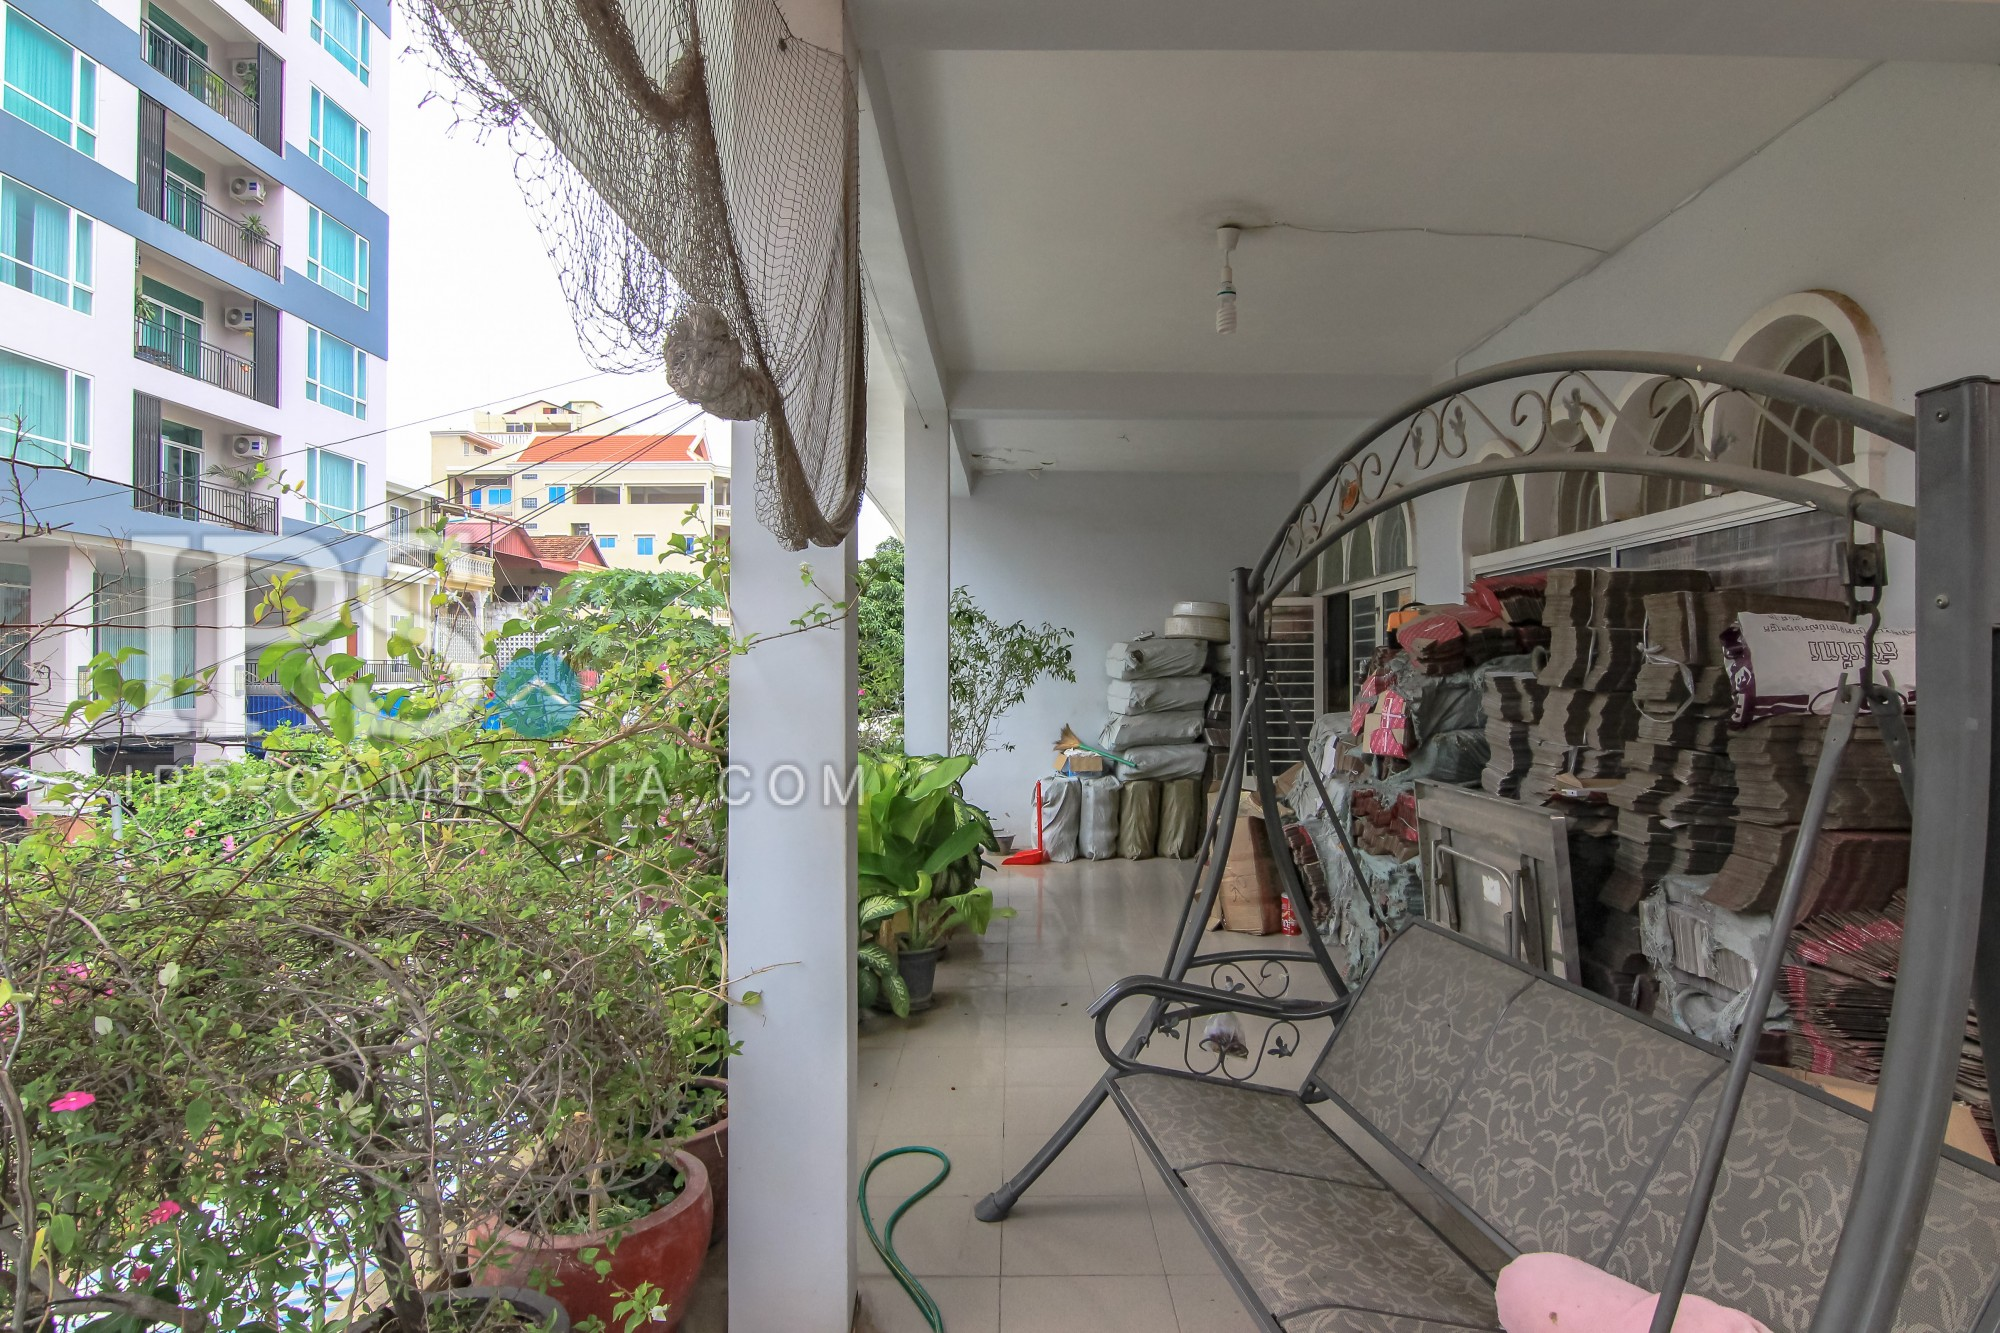 405 sqm Land and Villa For Sale - BKK3